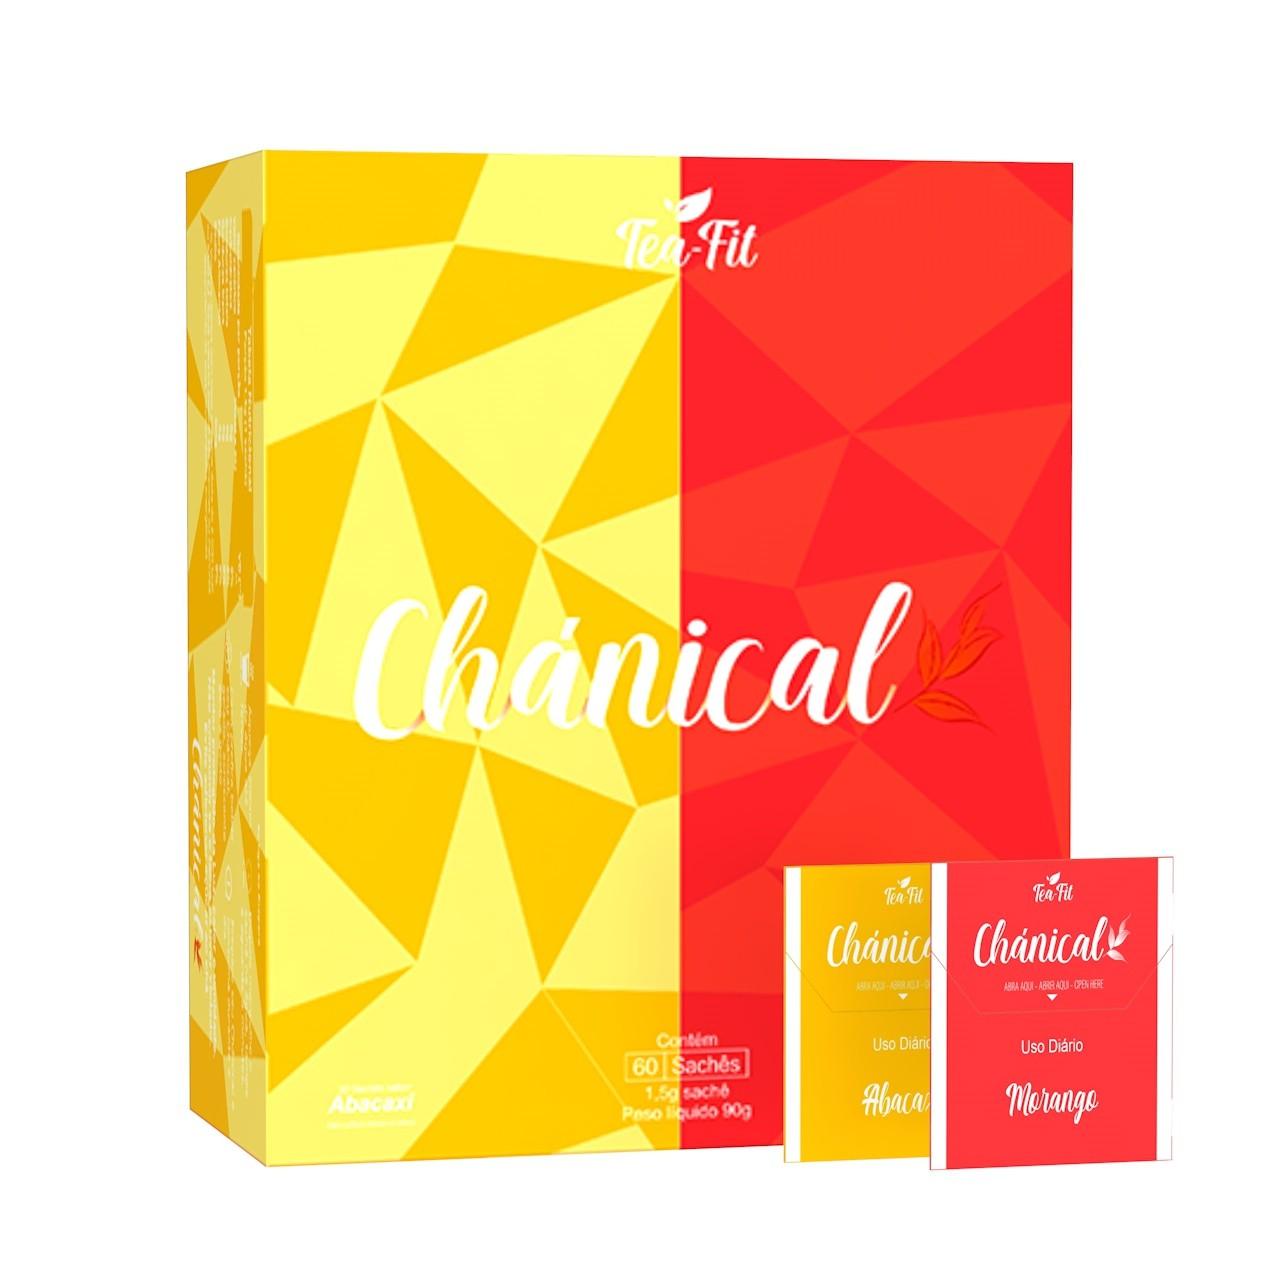 Chánical Tea-Fit 60 Saches Morango e Abacaxi  - KFit Nutrition